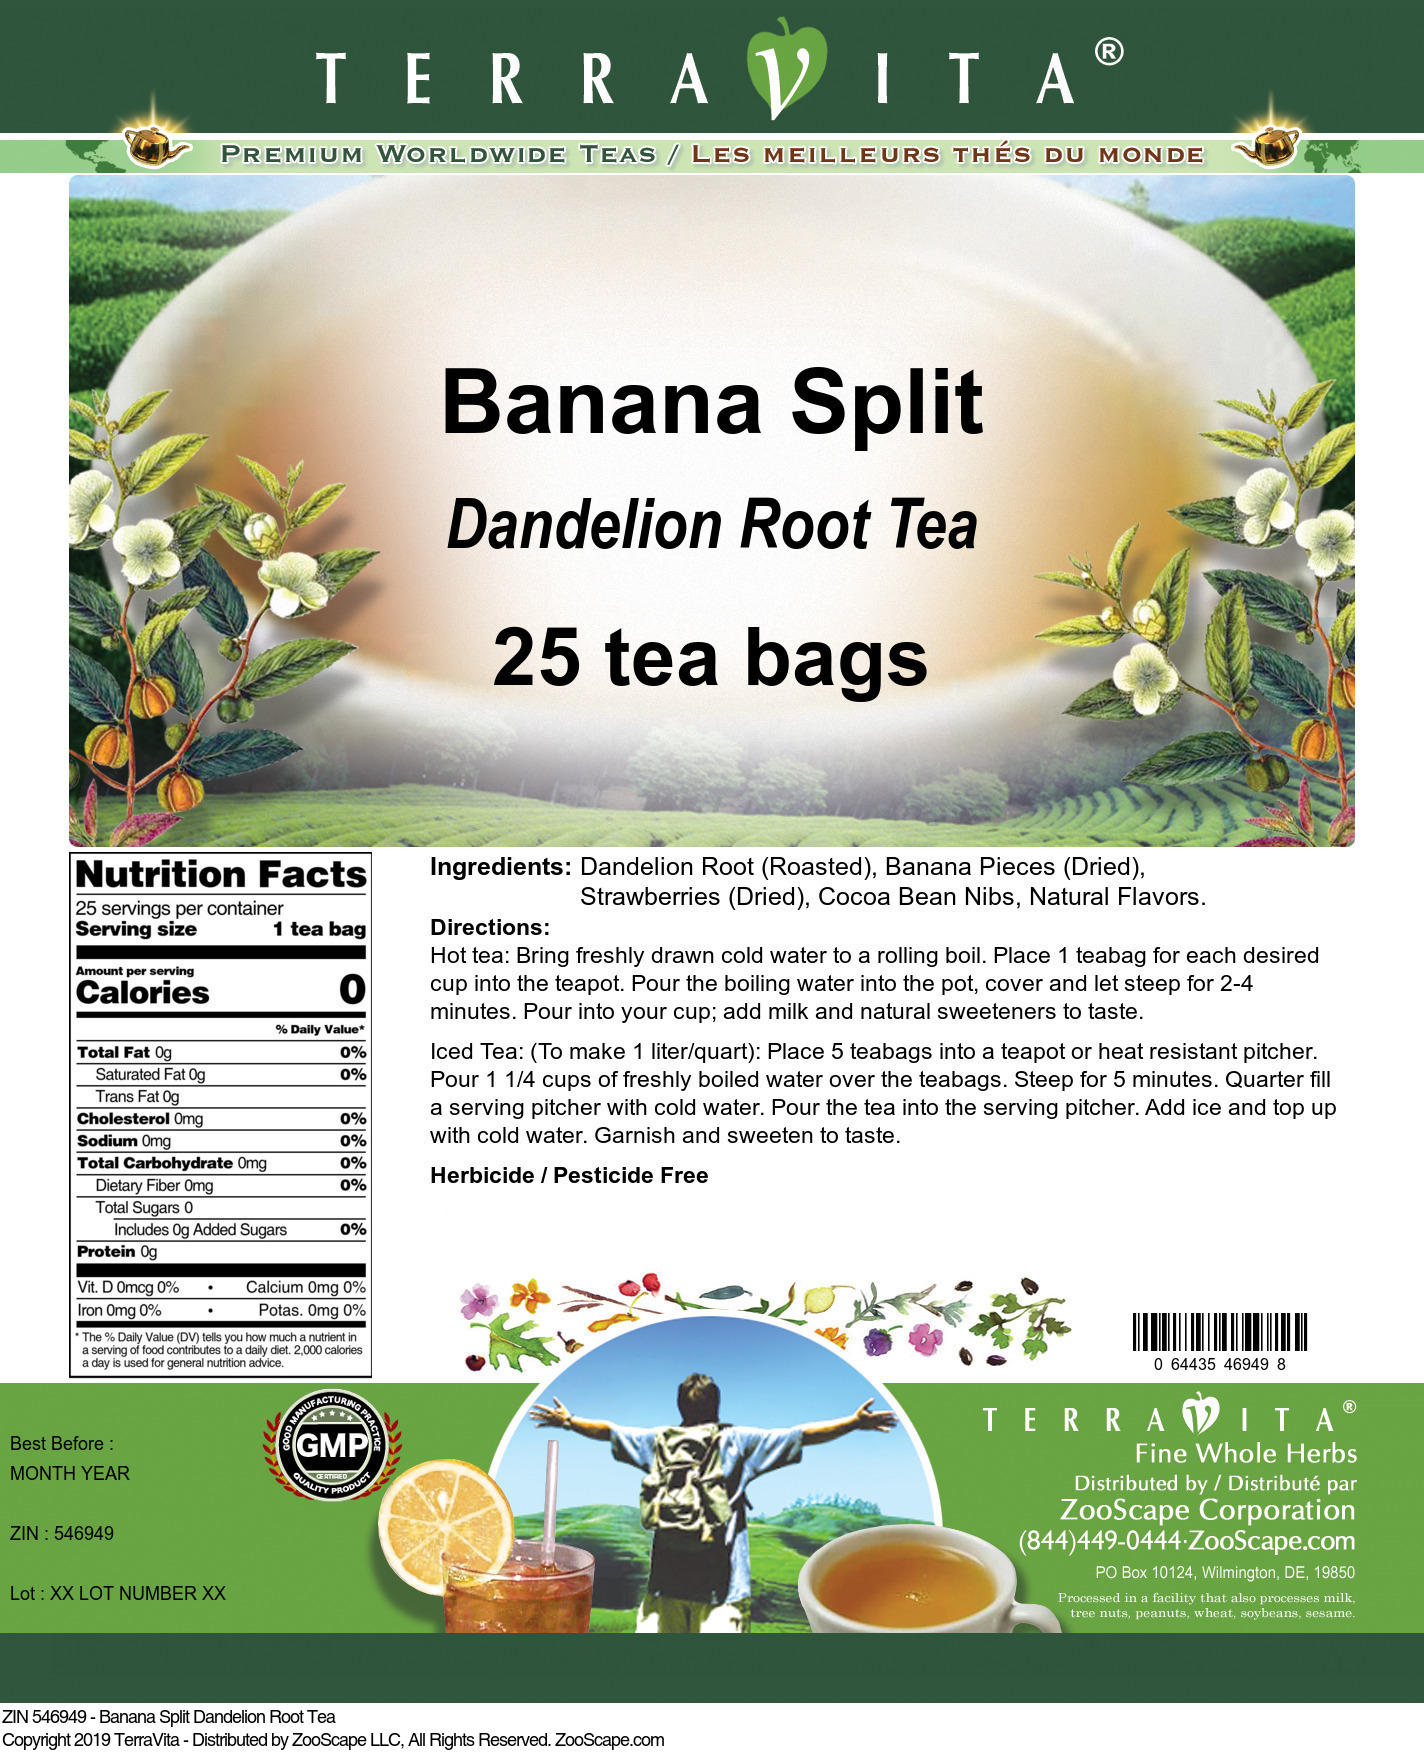 Banana Split Dandelion Root Tea